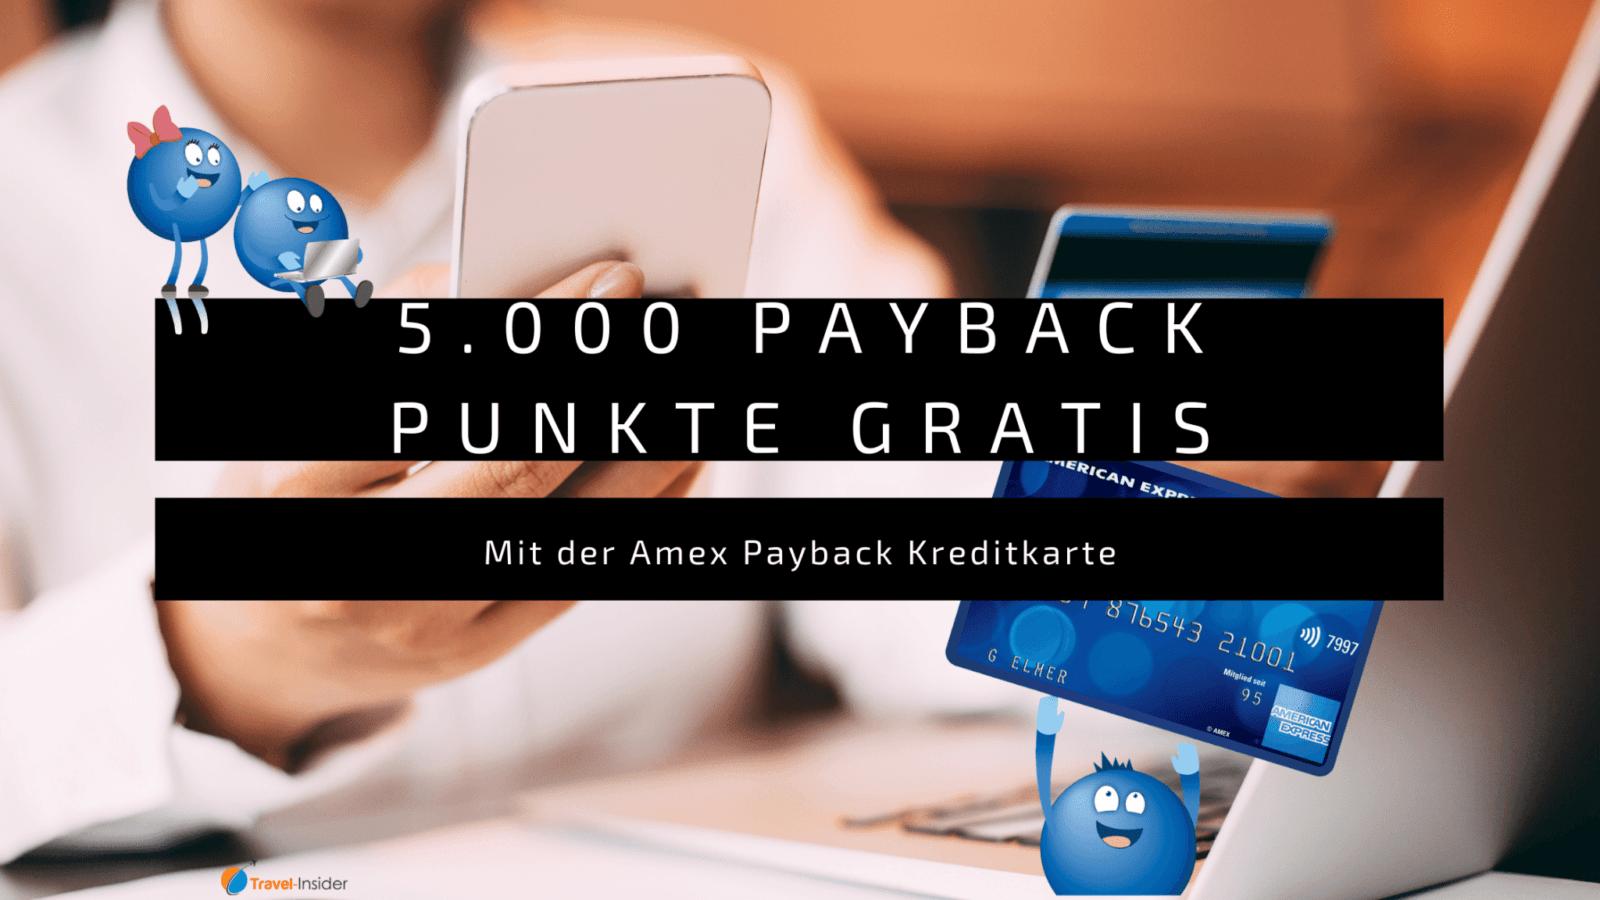 Amex Payback Kreditkarte mit 5.000 Punkten Willkommensbonus